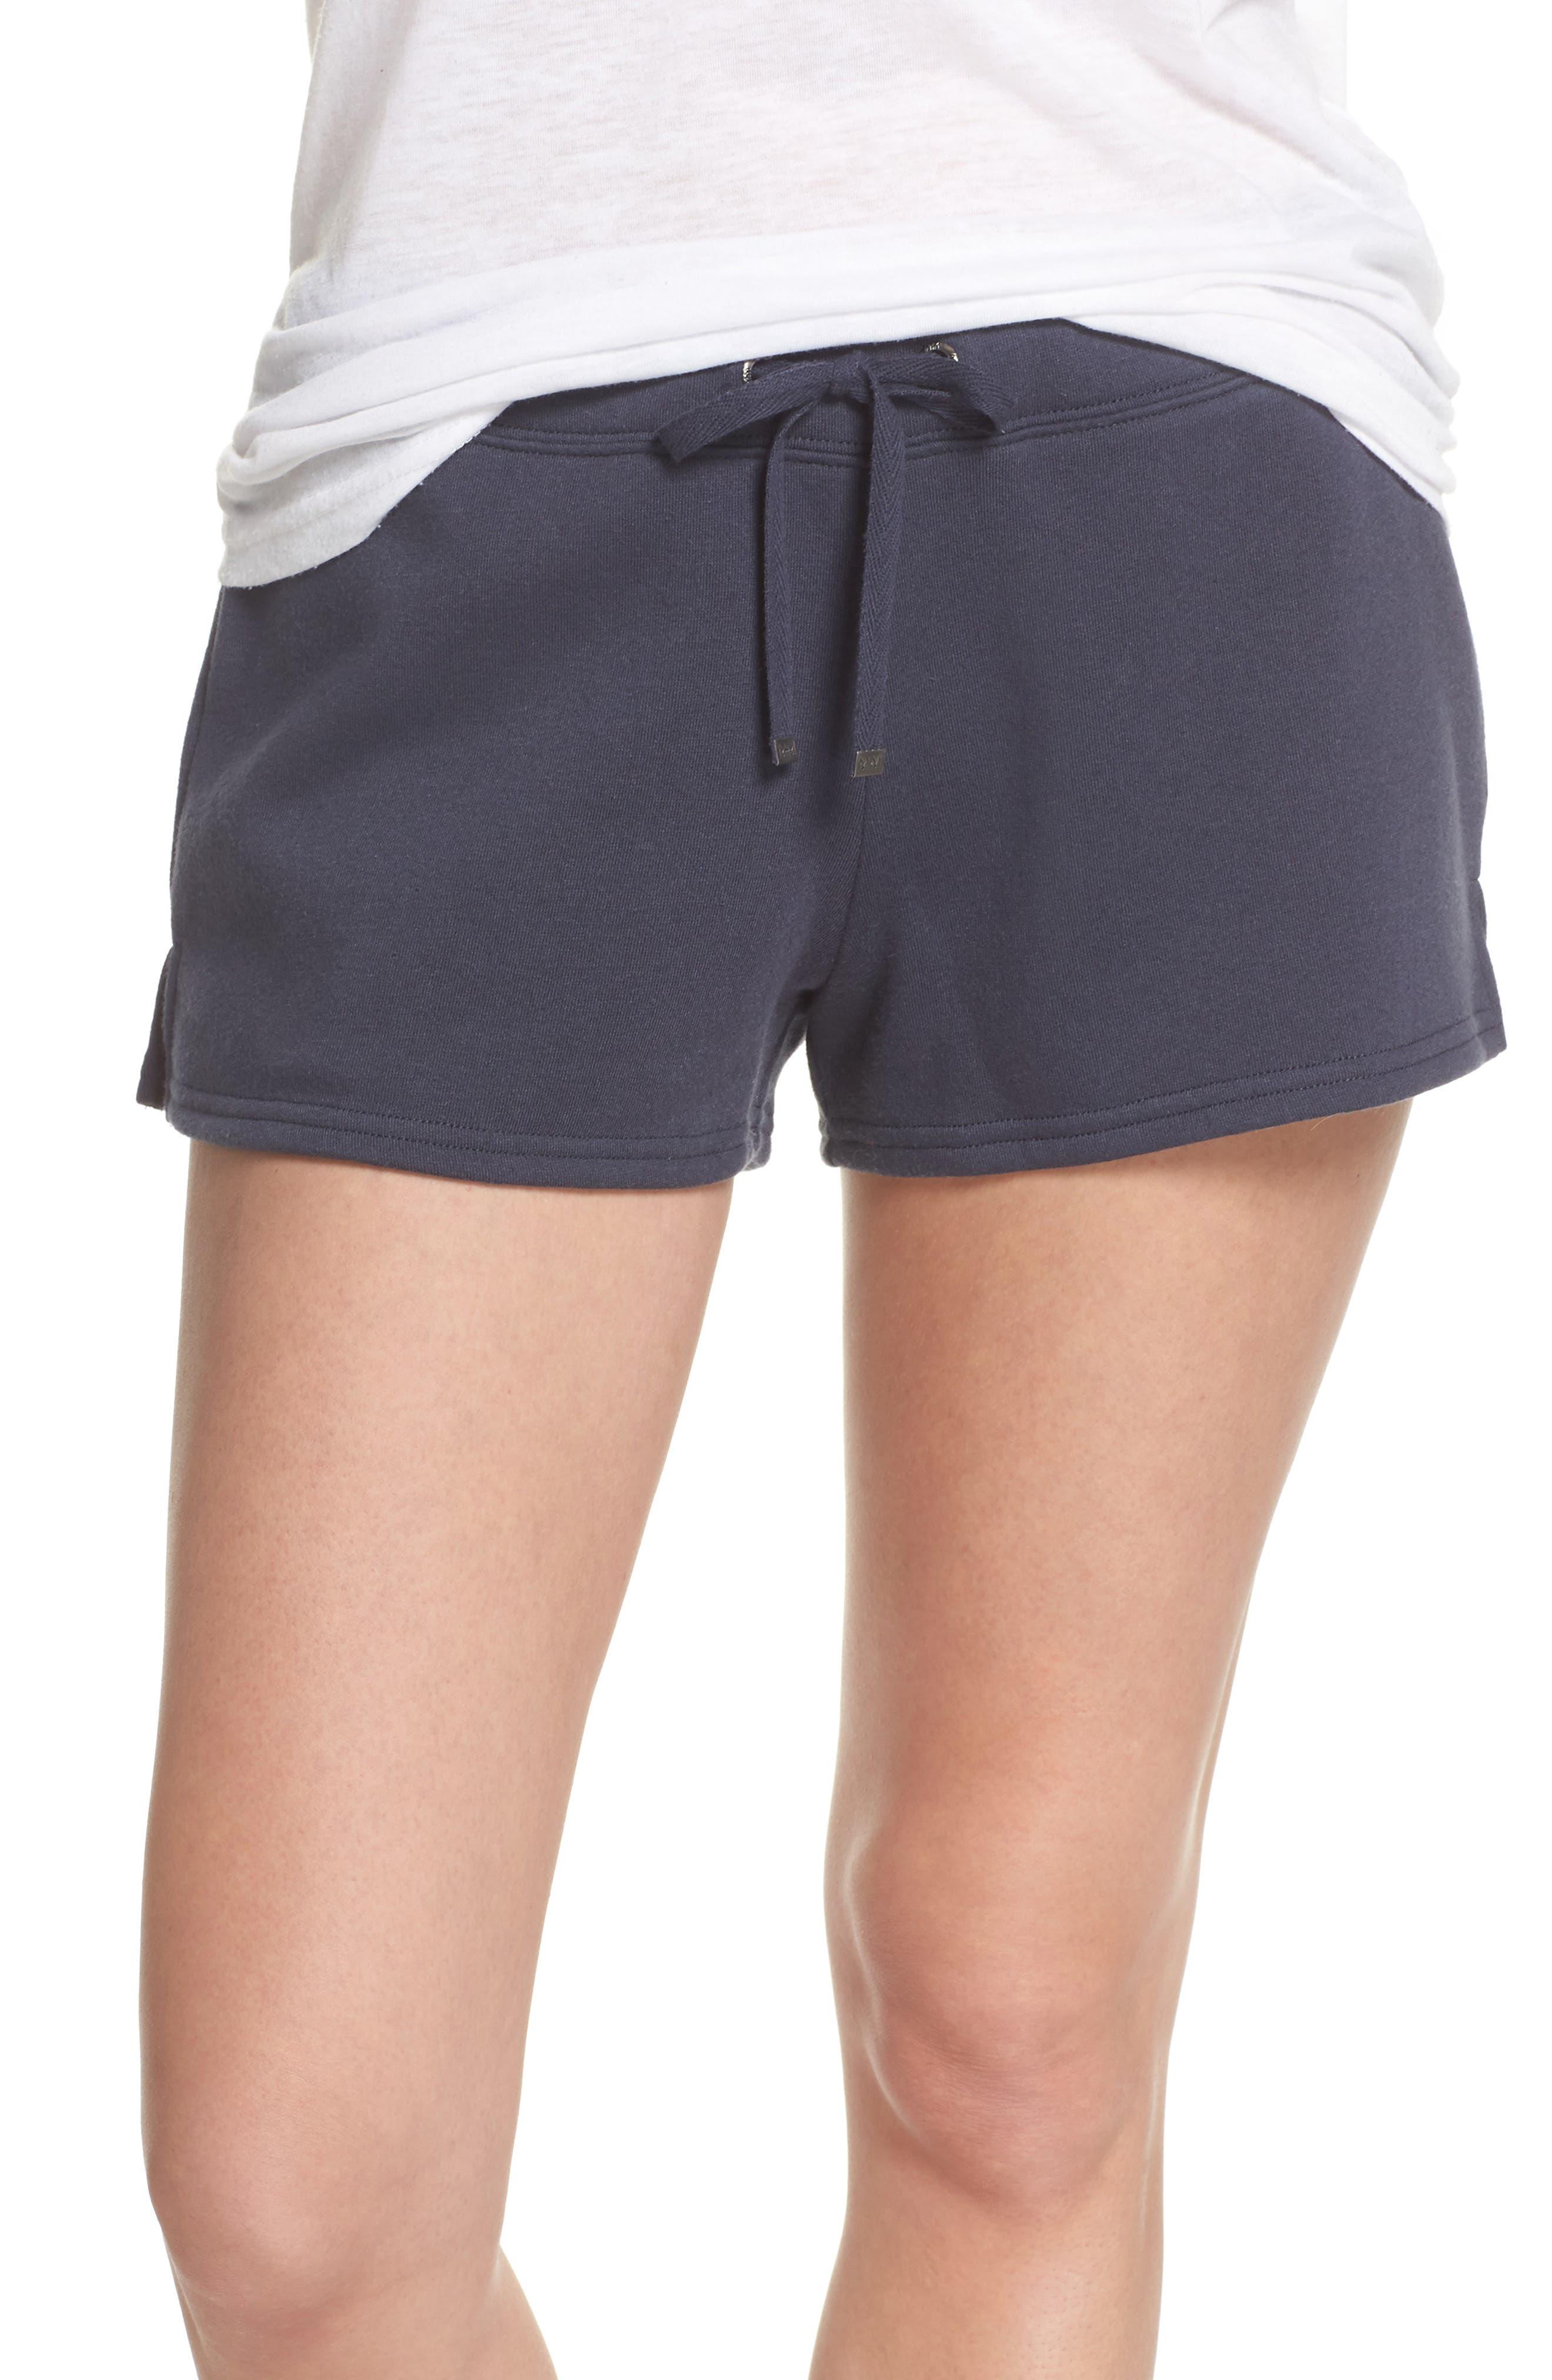 Take It Easy Lounge Shorts,                             Main thumbnail 1, color,                             Navy Blue